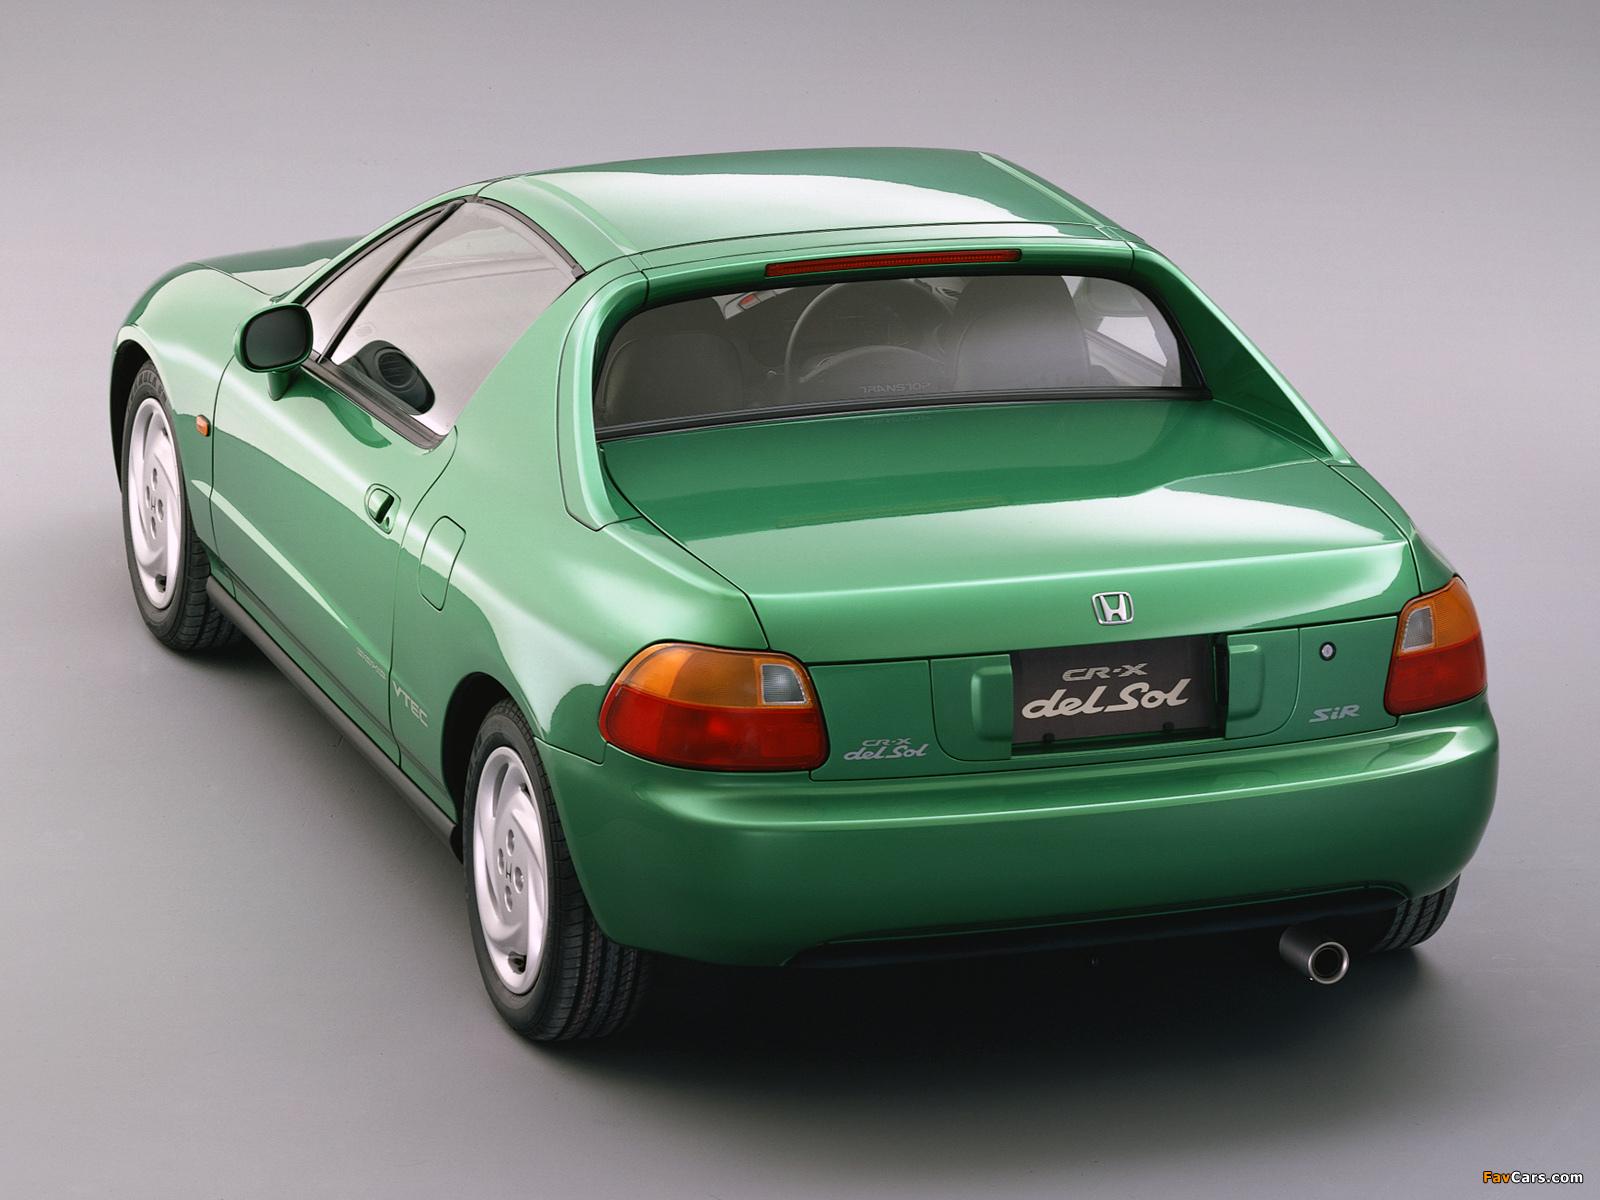 Honda Cr X >> Images of Honda CR-X del Sol SiR (EG2) 1992–98 (1600x1200)